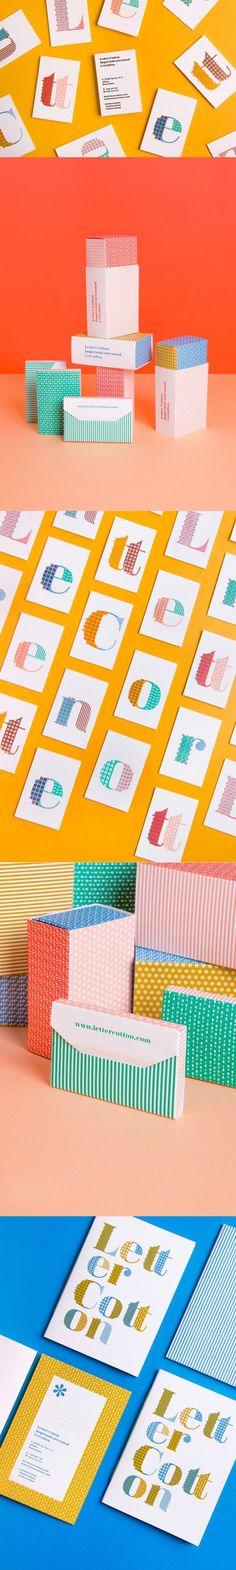 Colorful Branding Design